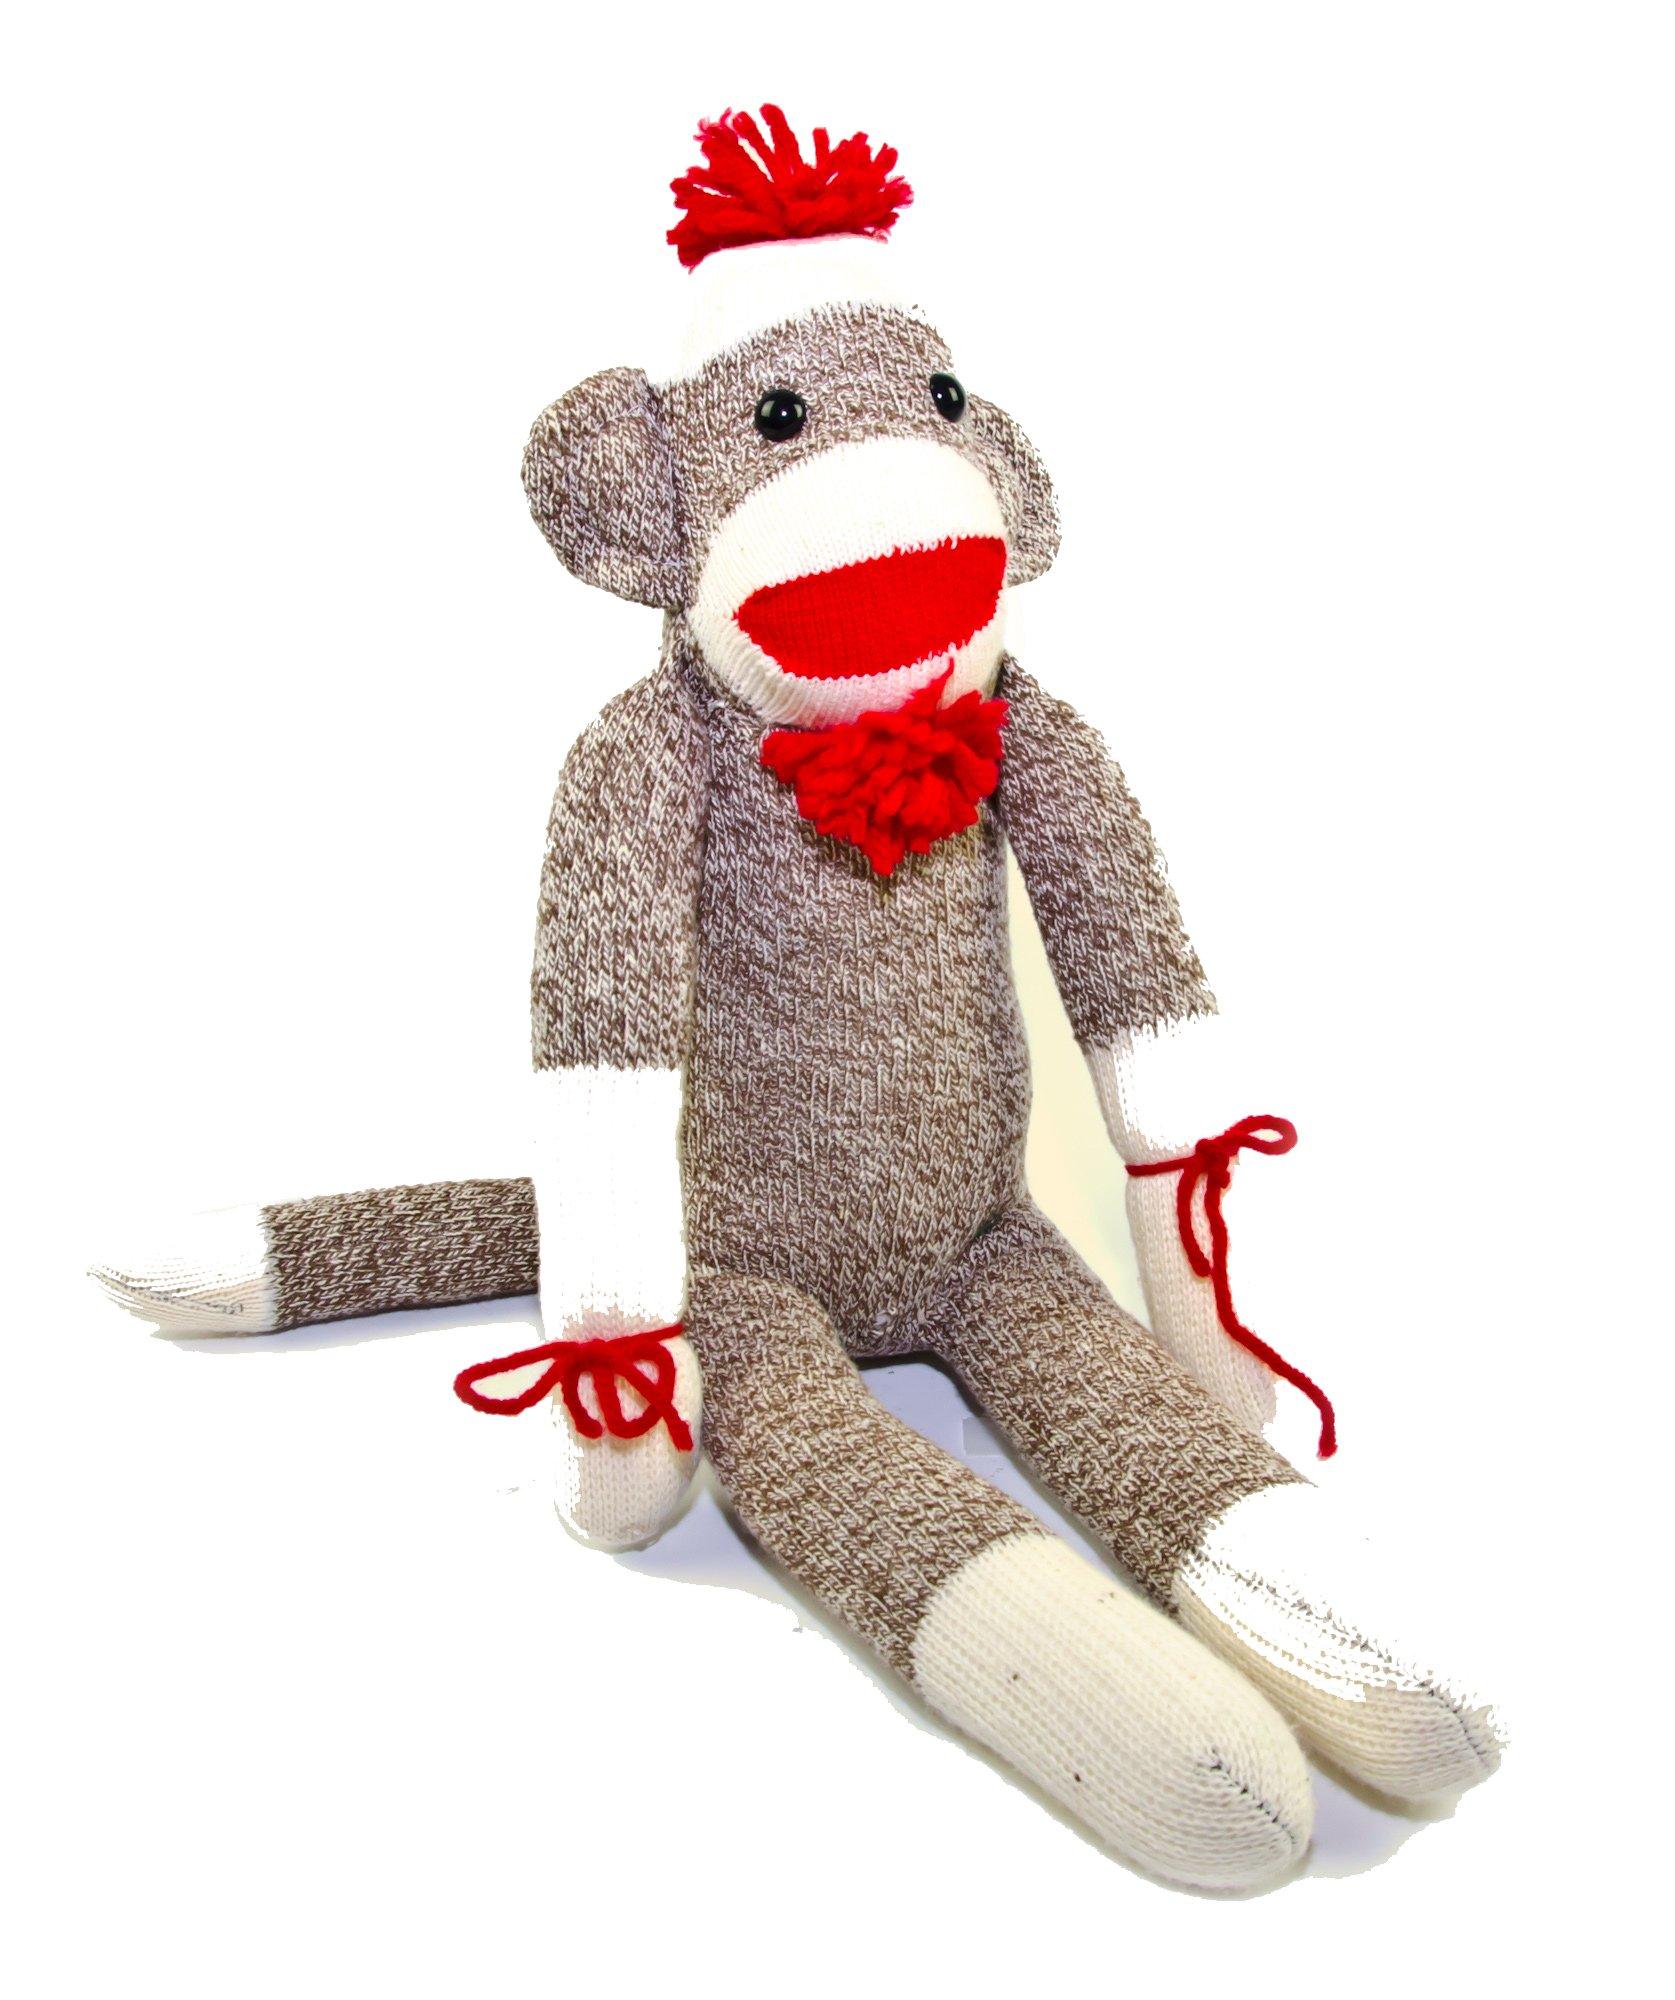 Sock Monkey | Toys Games | Toys | Plush Toys | Cracker Barrel Old Country  Store - Cracker Barrel Old Country Store